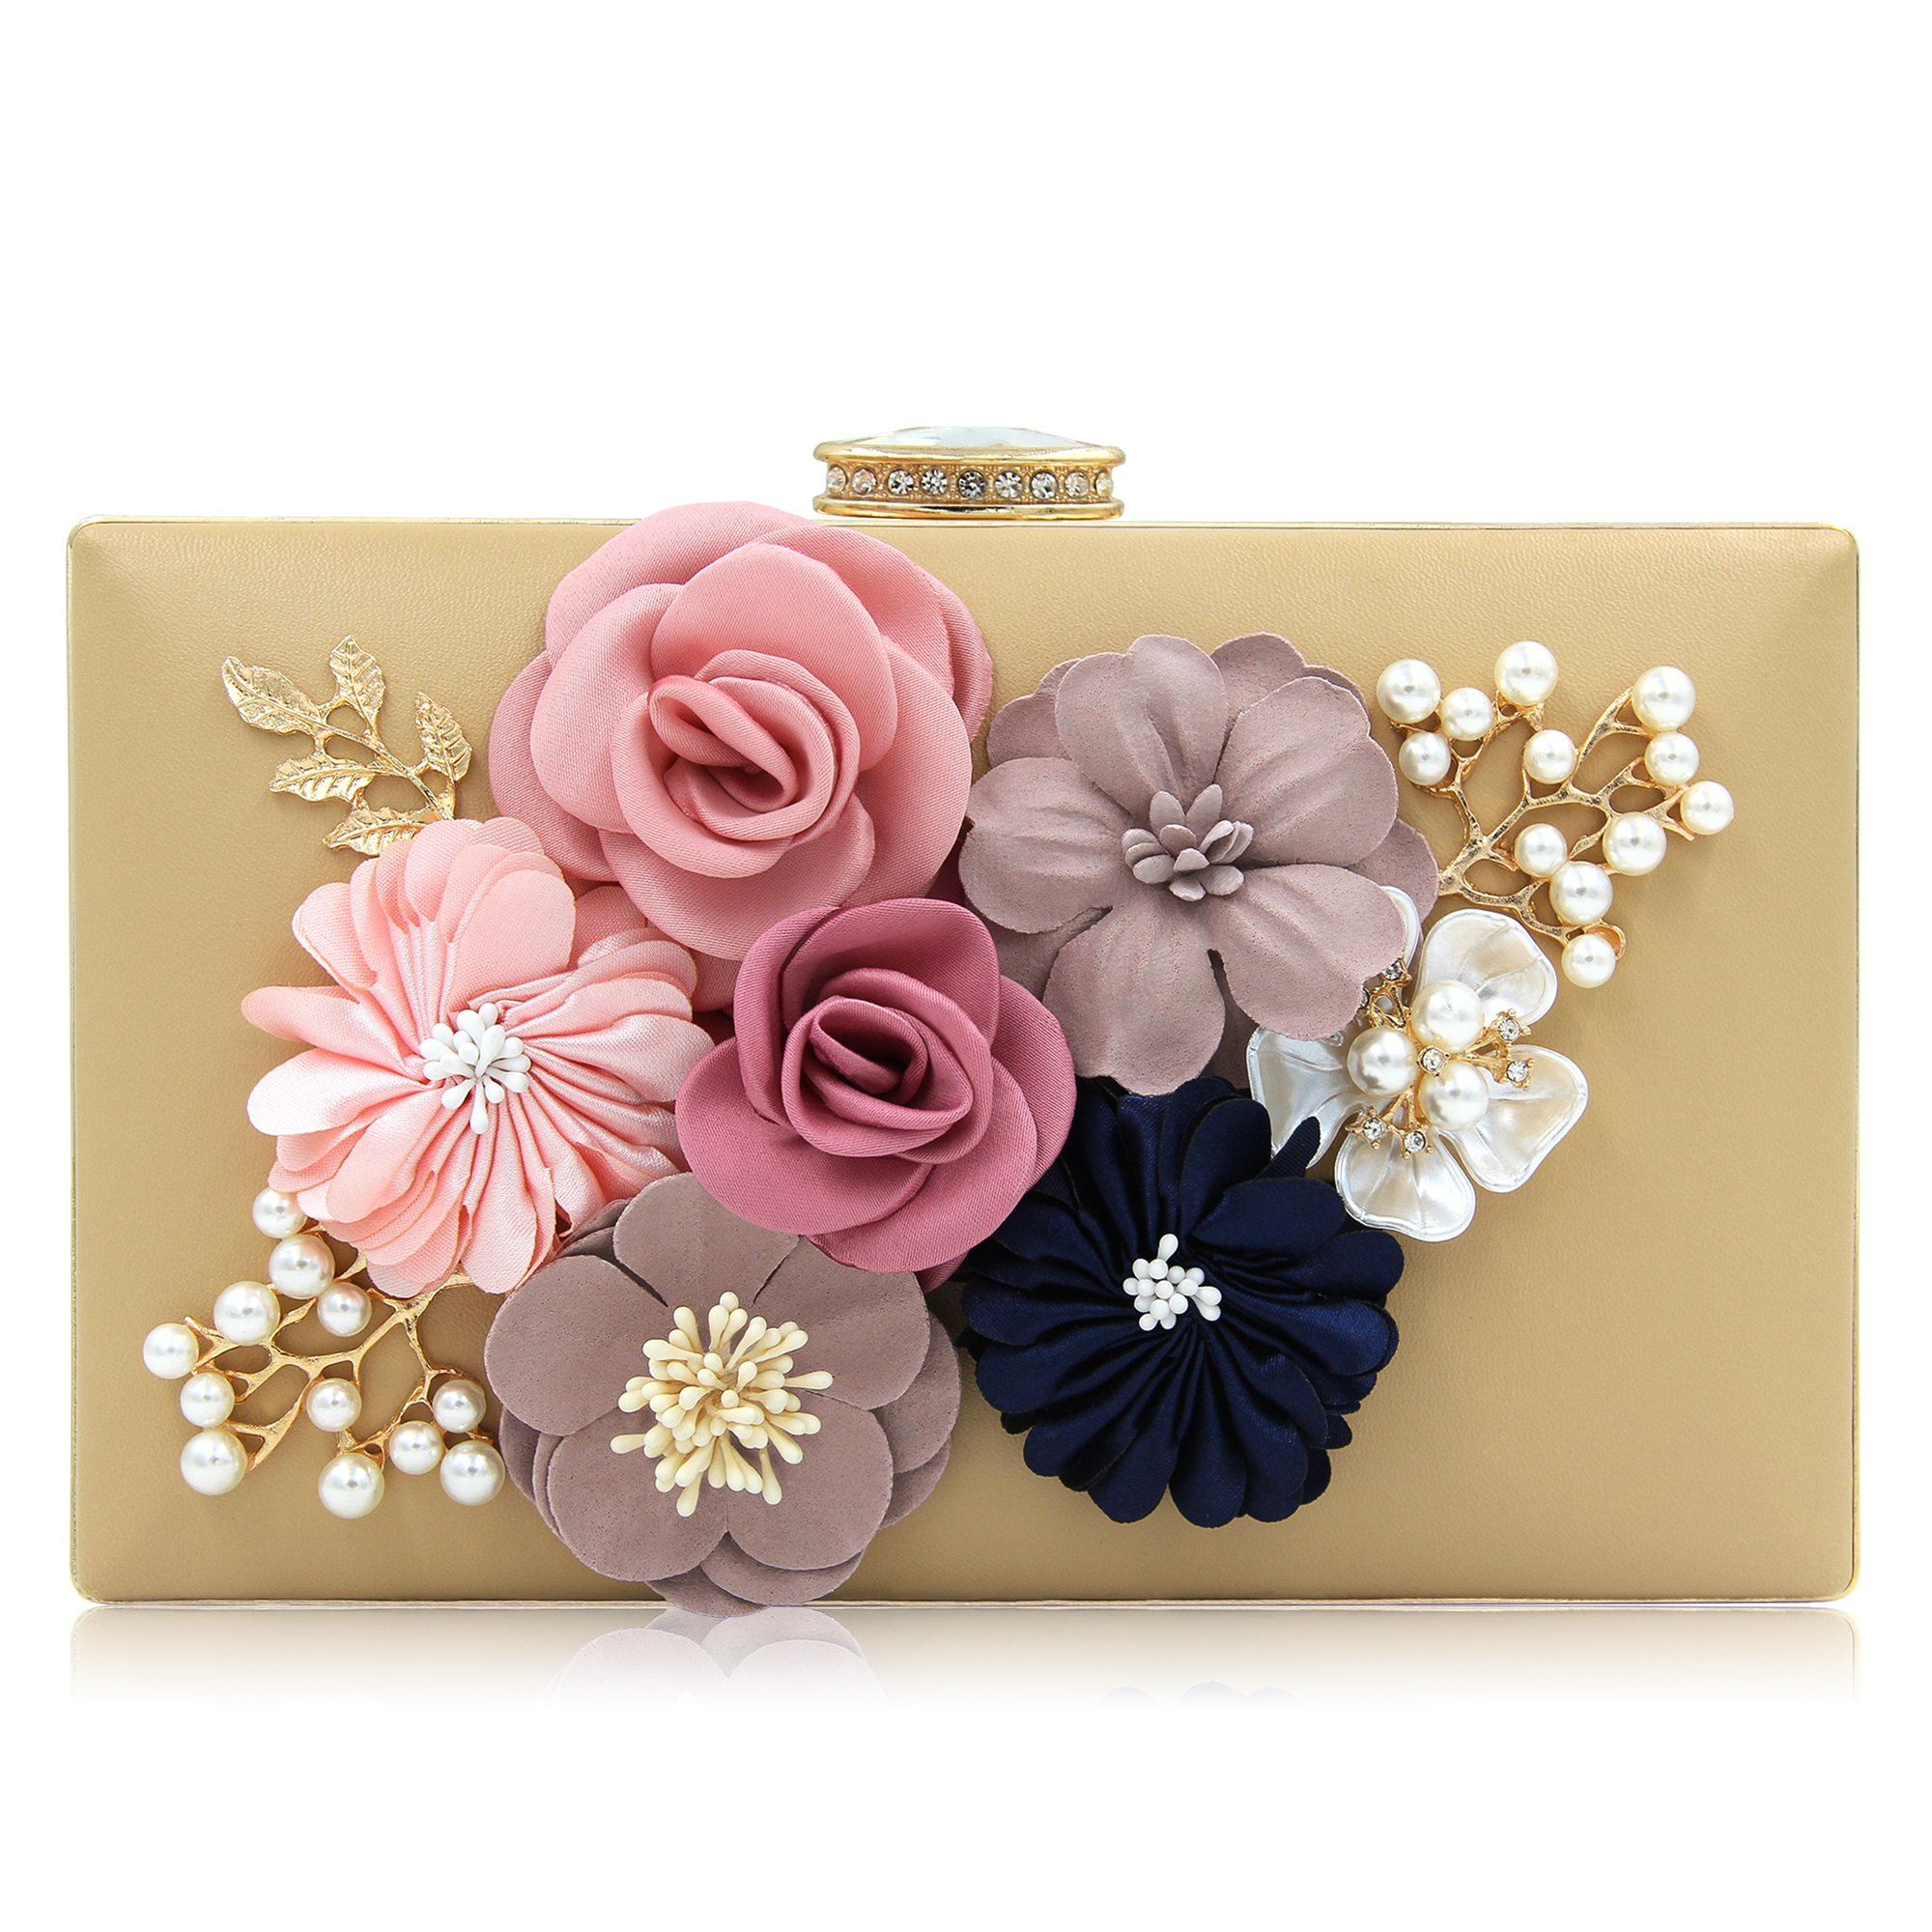 Milisente Women Flower Clutches Evening Bags Handbags Wedding Clutch Purse (Beige)